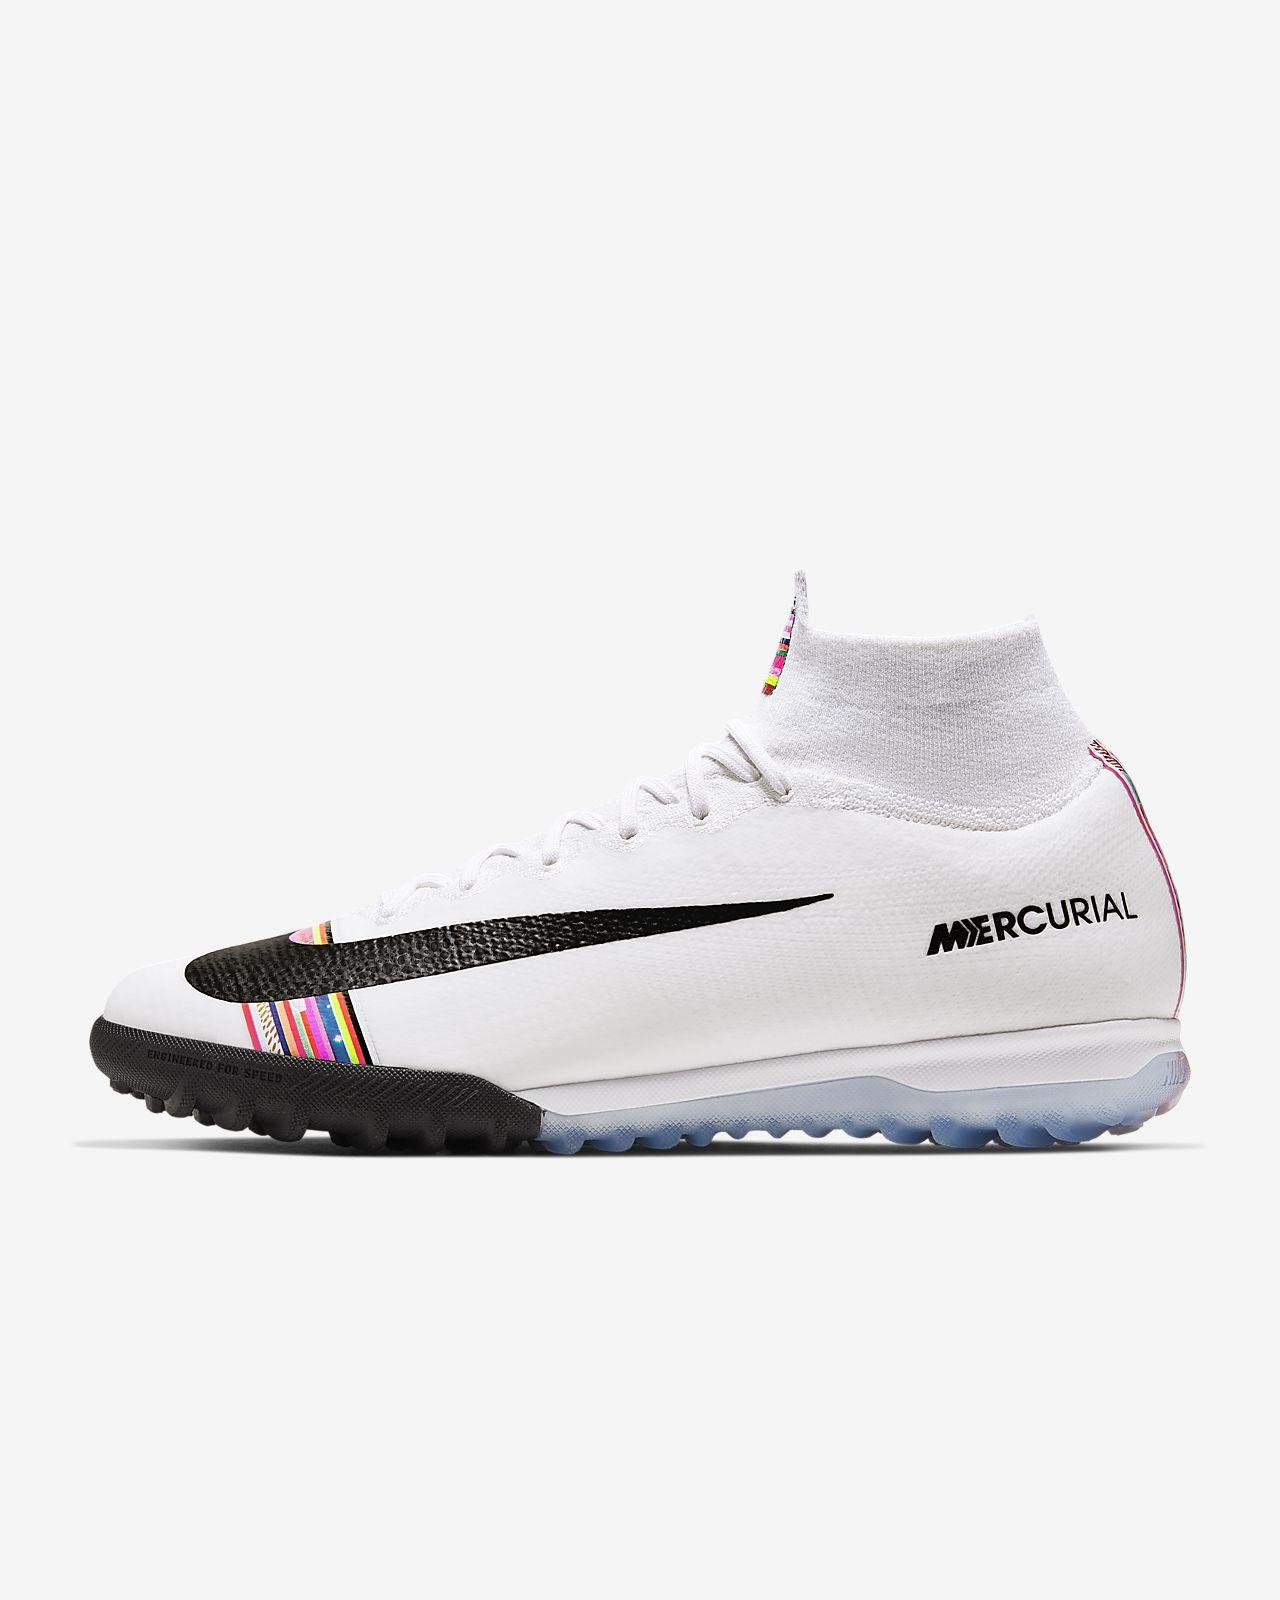 finest selection 5c337 7a703 ... Nike SuperflyX 6 Elite LVL UP TF Botas de fútbol para moqueta - Turf